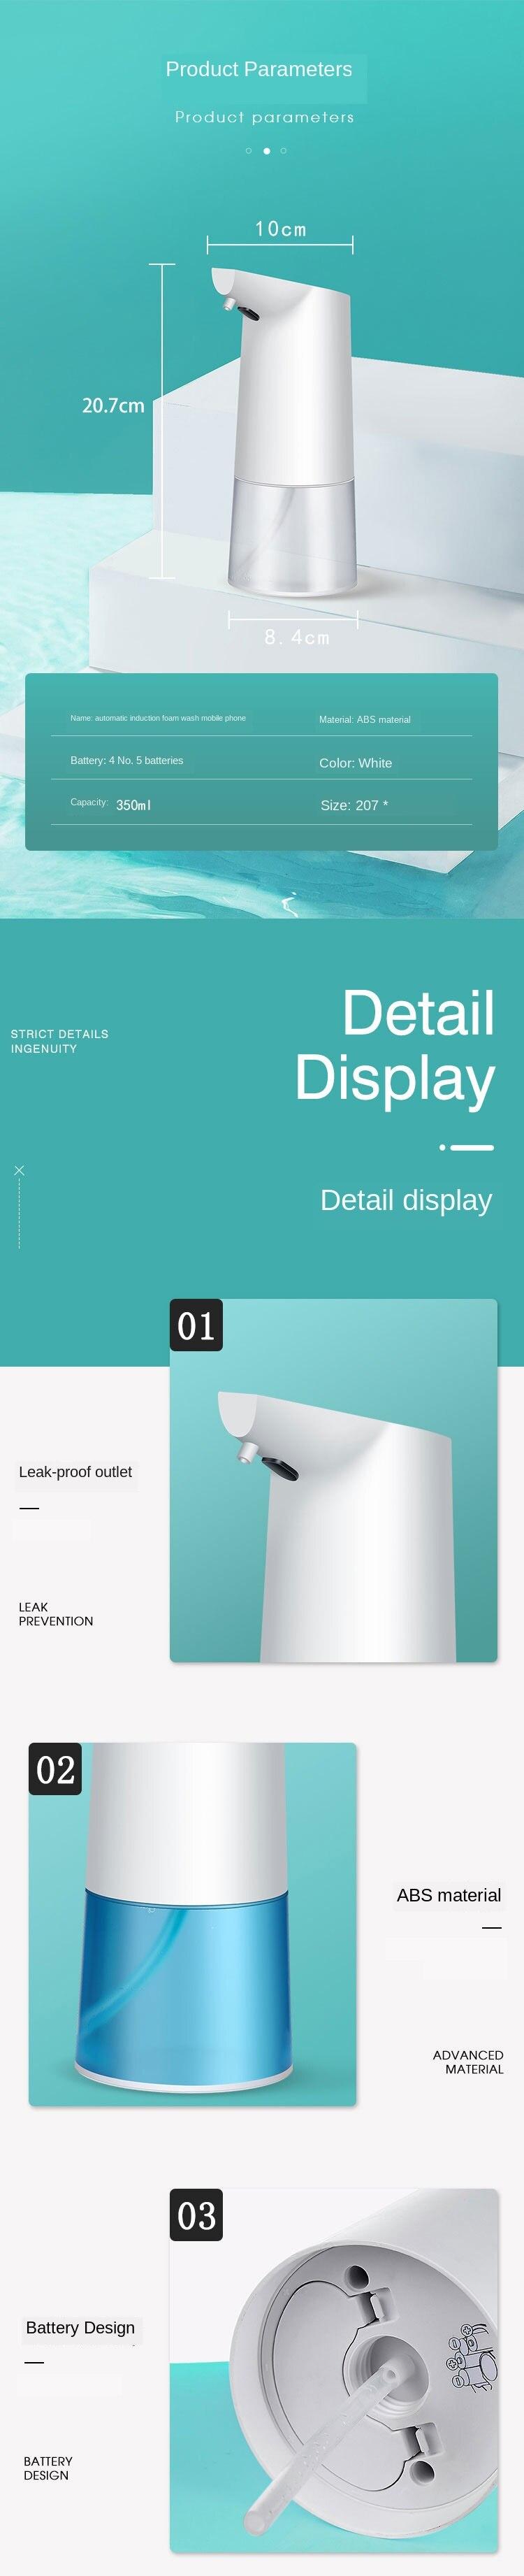 Hb5df54812ca74860b861ef81c111cf919 Automatic Foam Soap Dispenser Infrared Sensing Foam Soap Dispenser Induction Liquid Soap Dispenser For Bathroom Kitchen Hotel